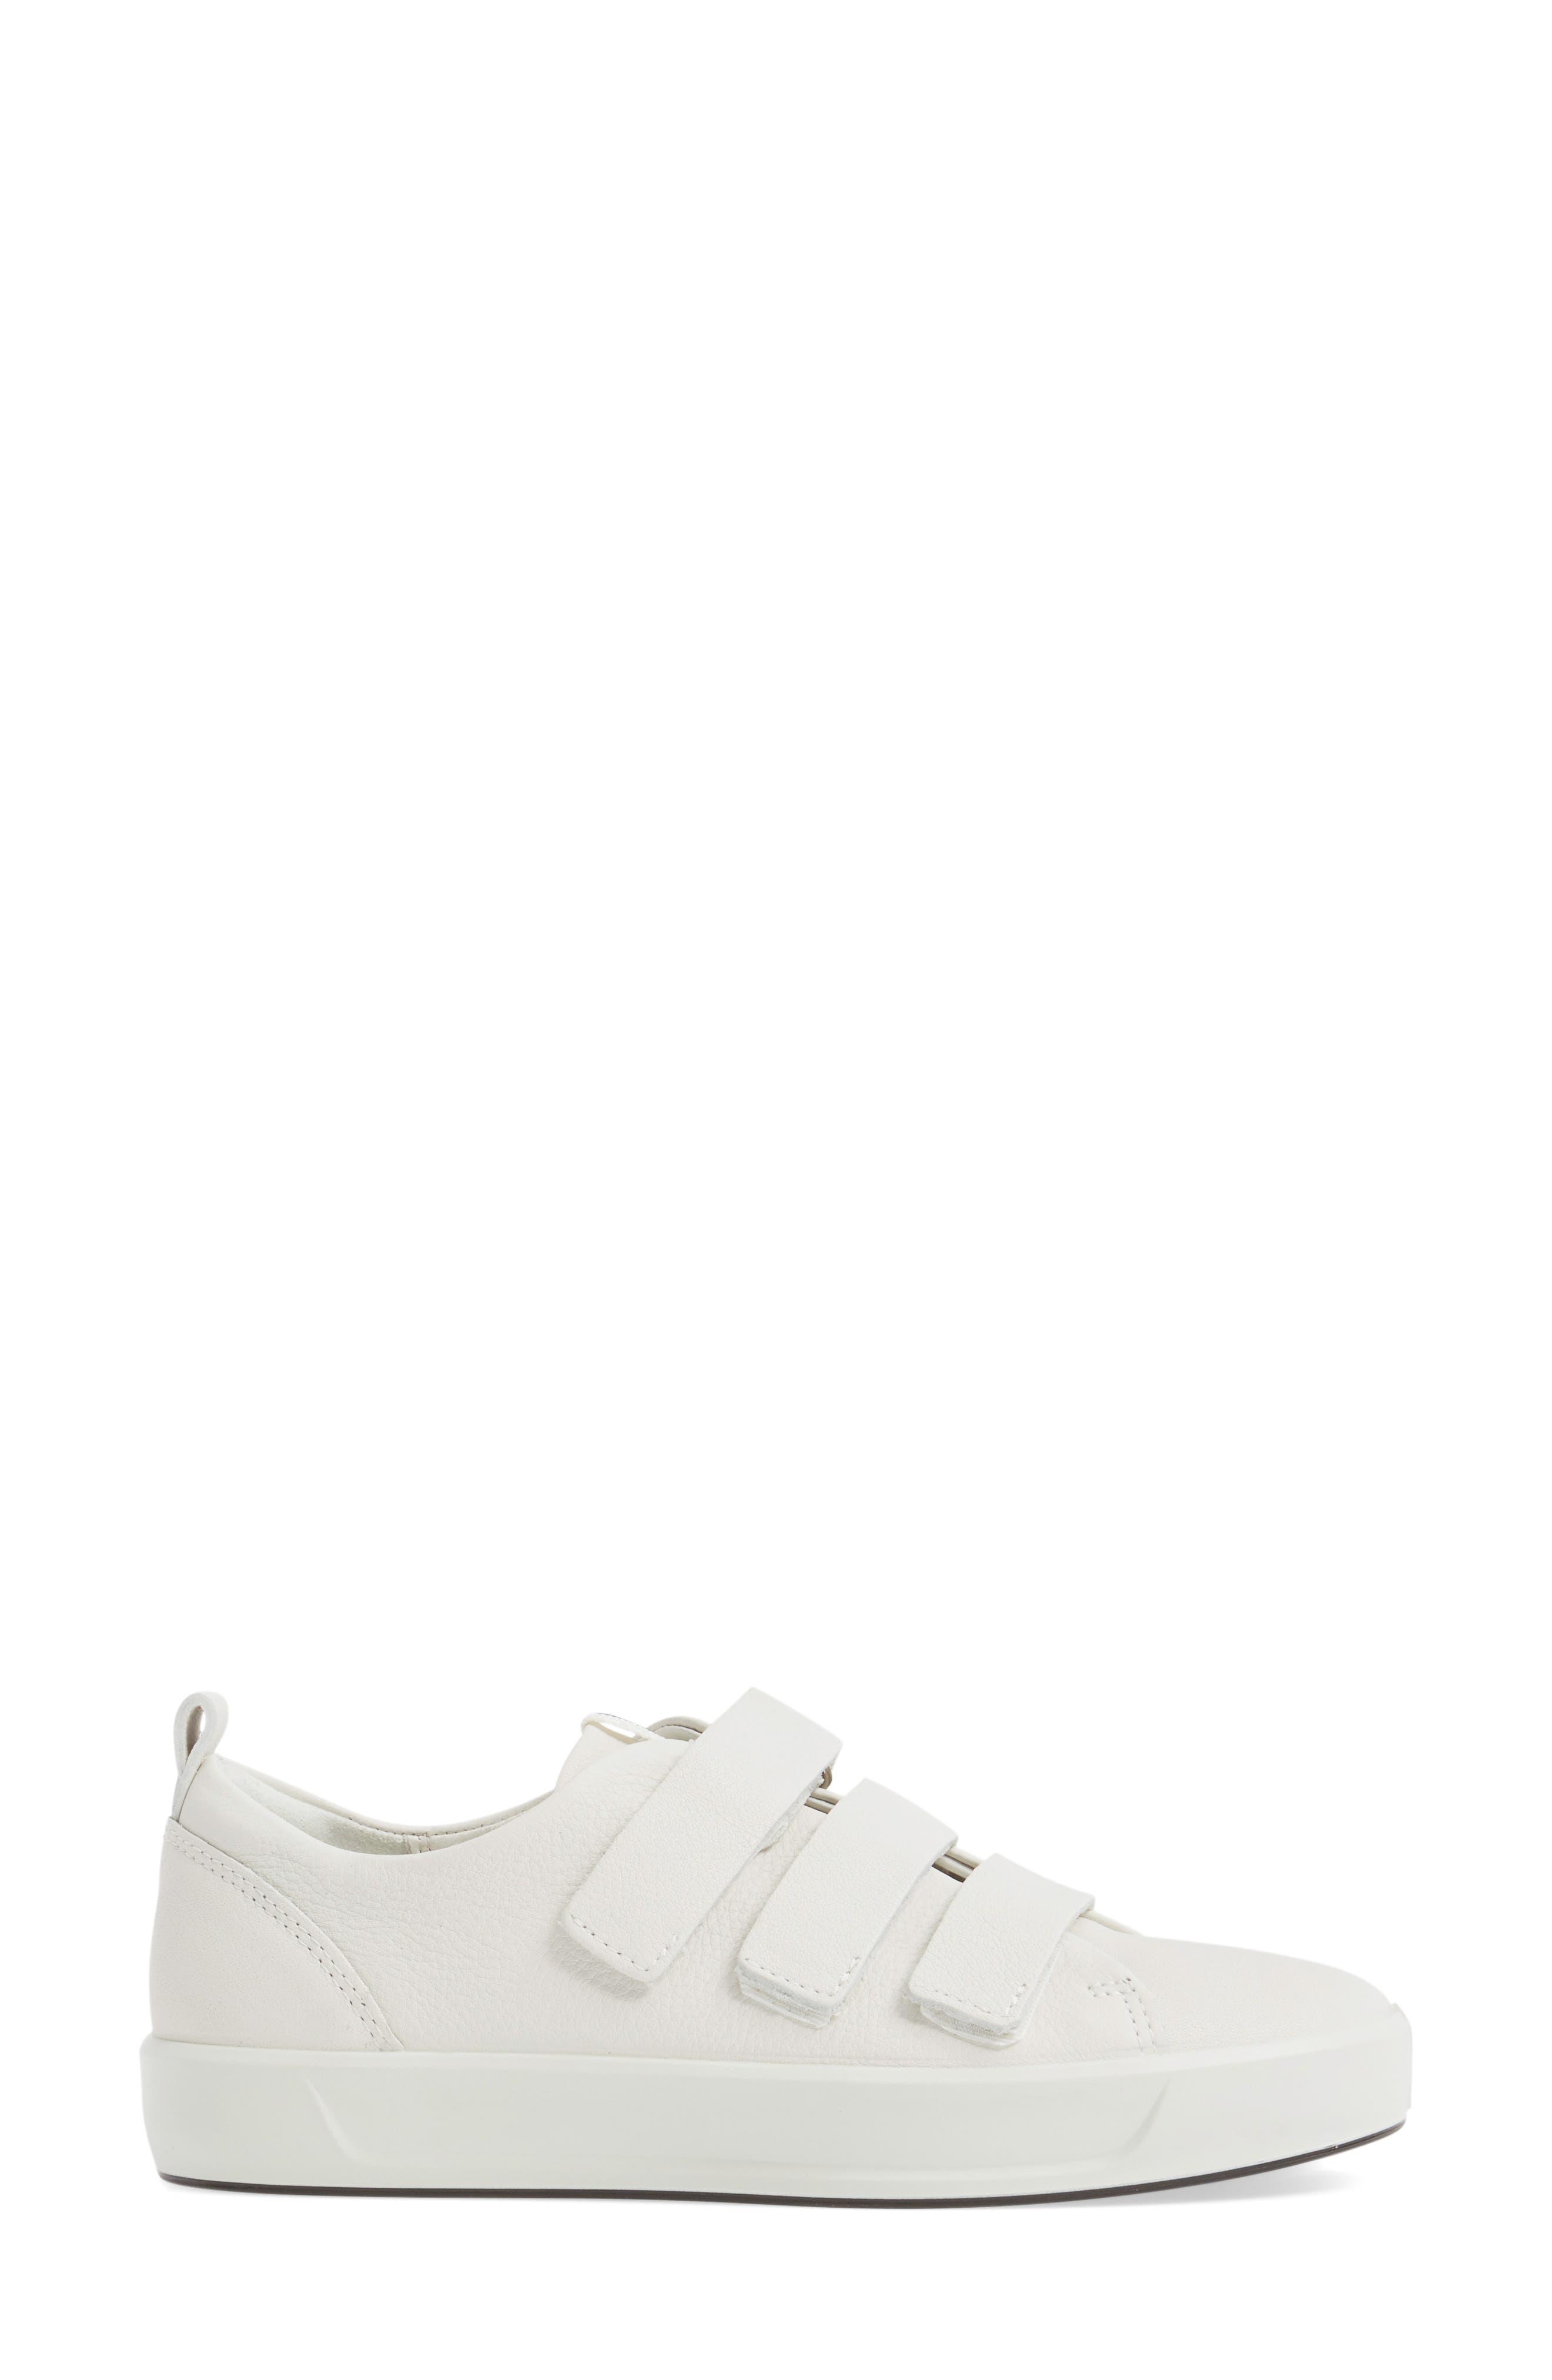 Soft 8 Sneaker,                             Alternate thumbnail 3, color,                             White Leather